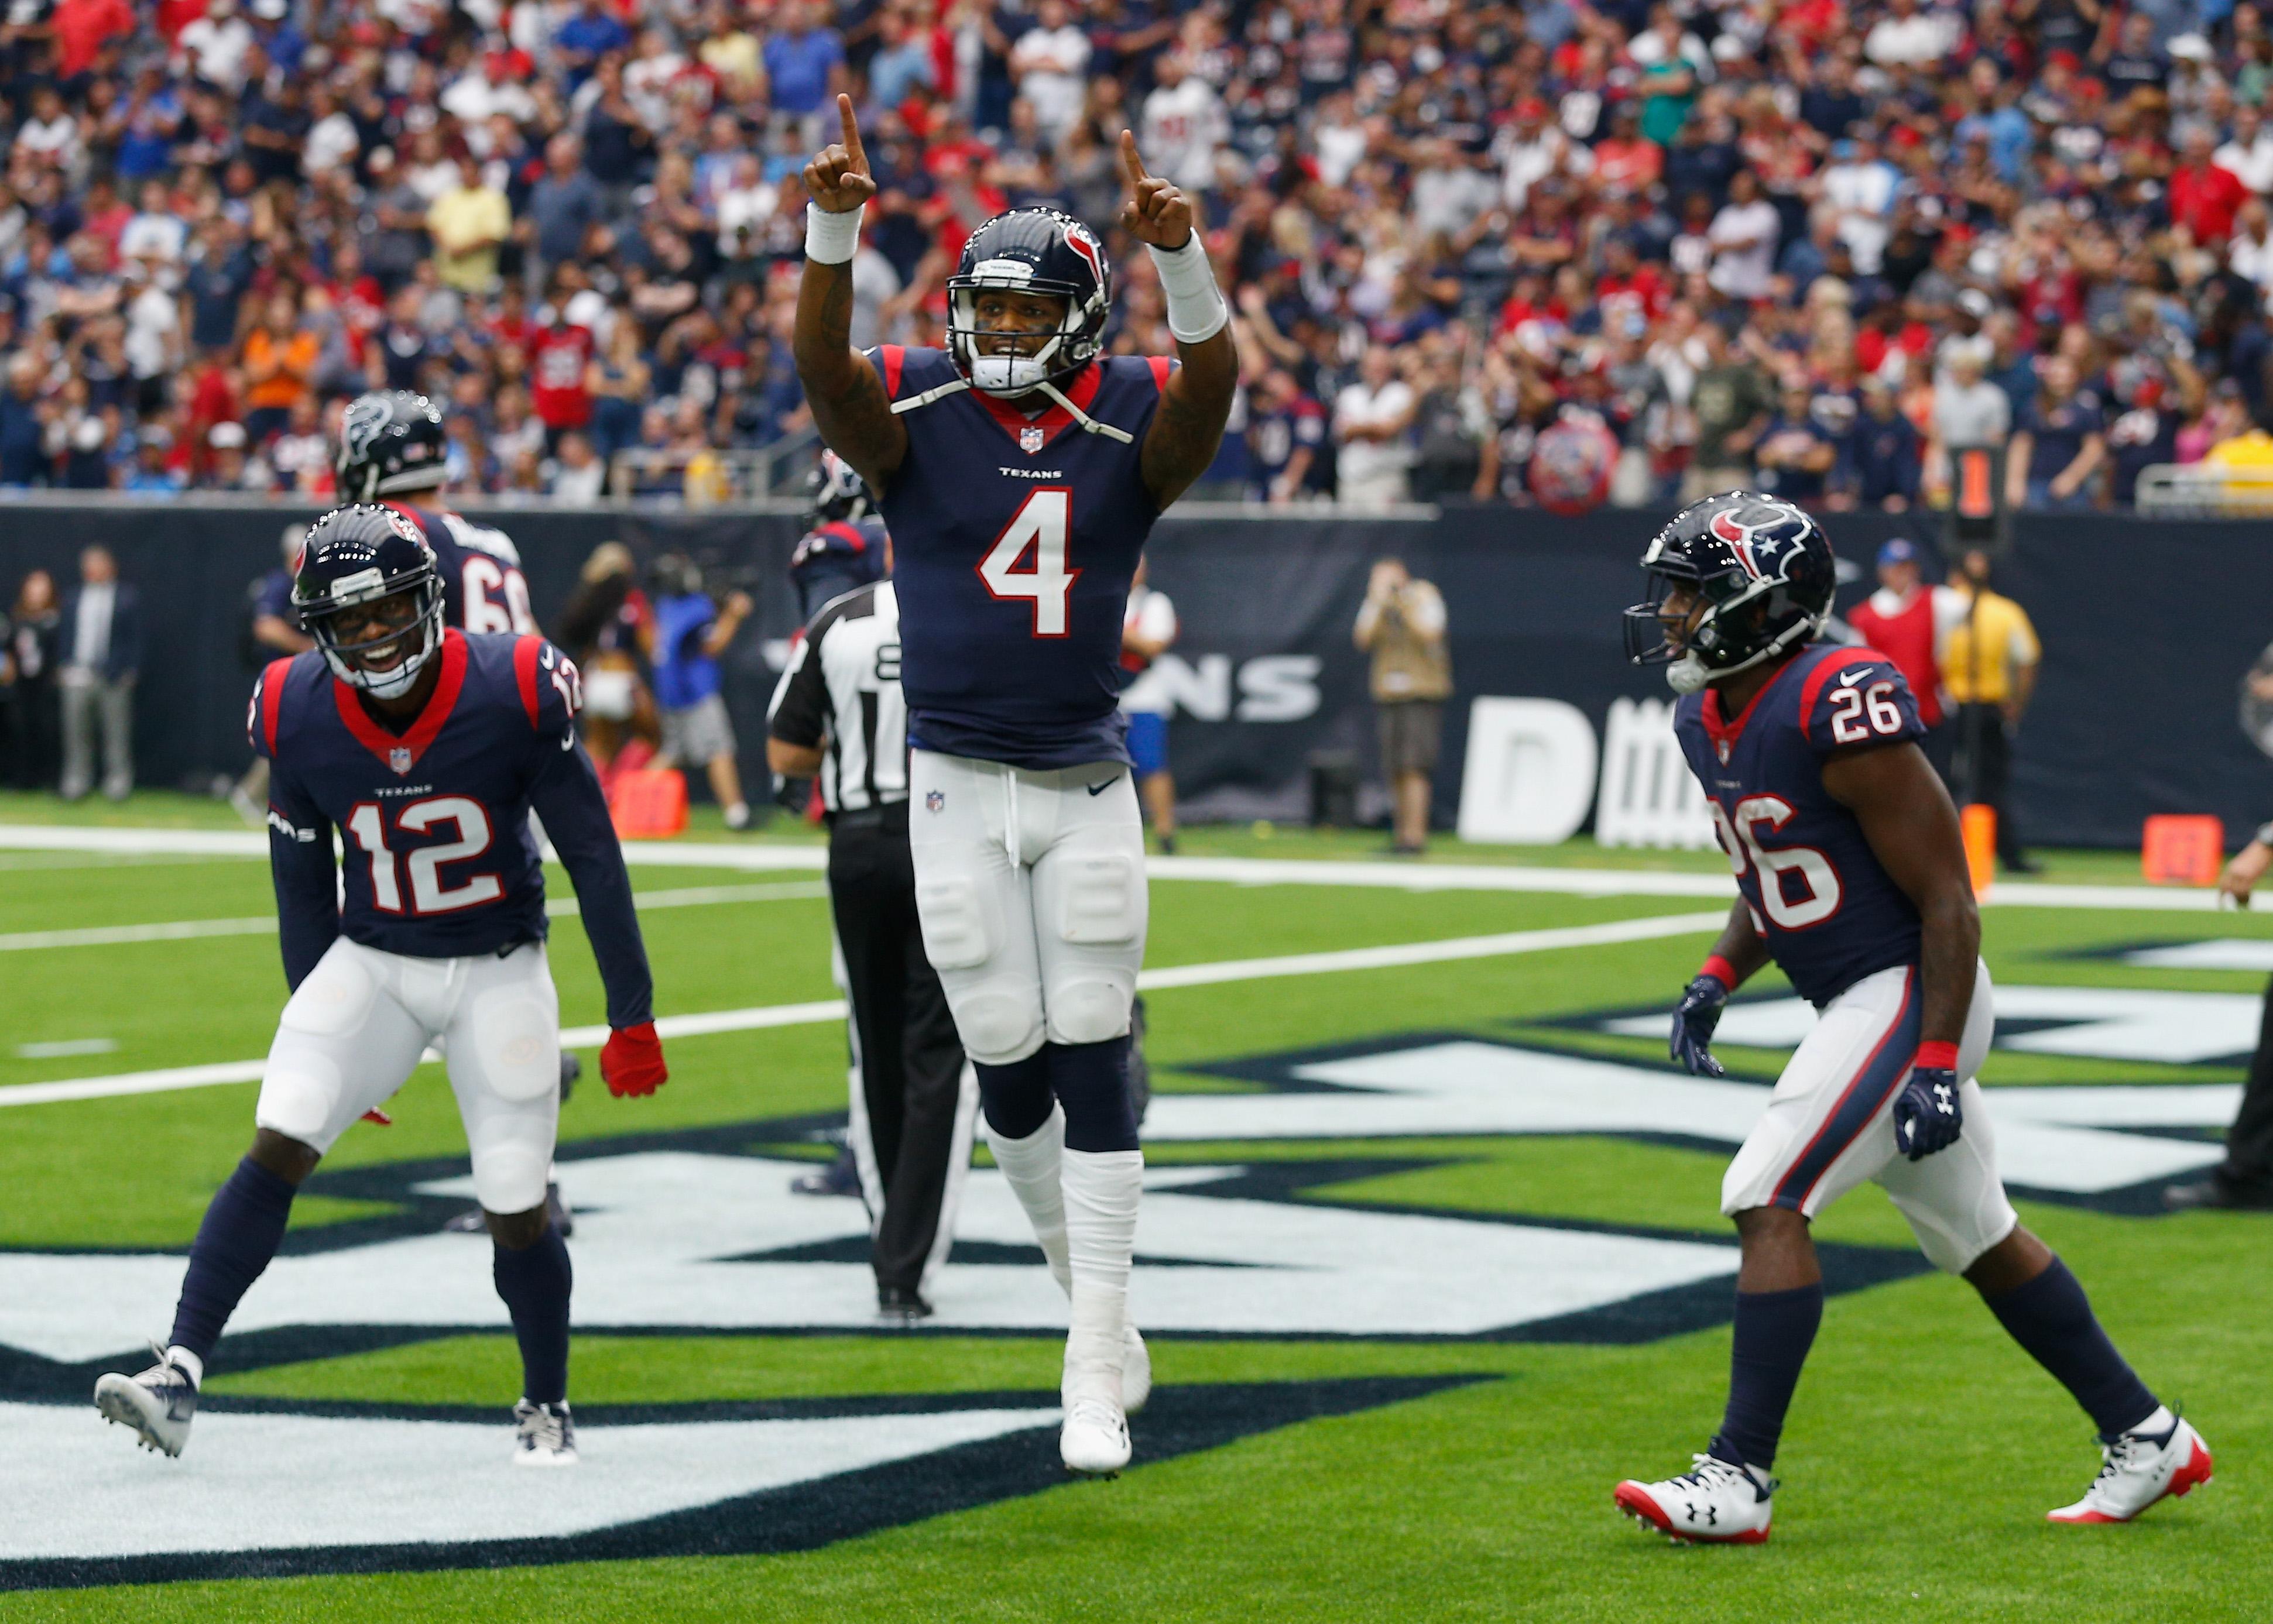 NFL Power Rankings 2017: Rams, Texans make statements